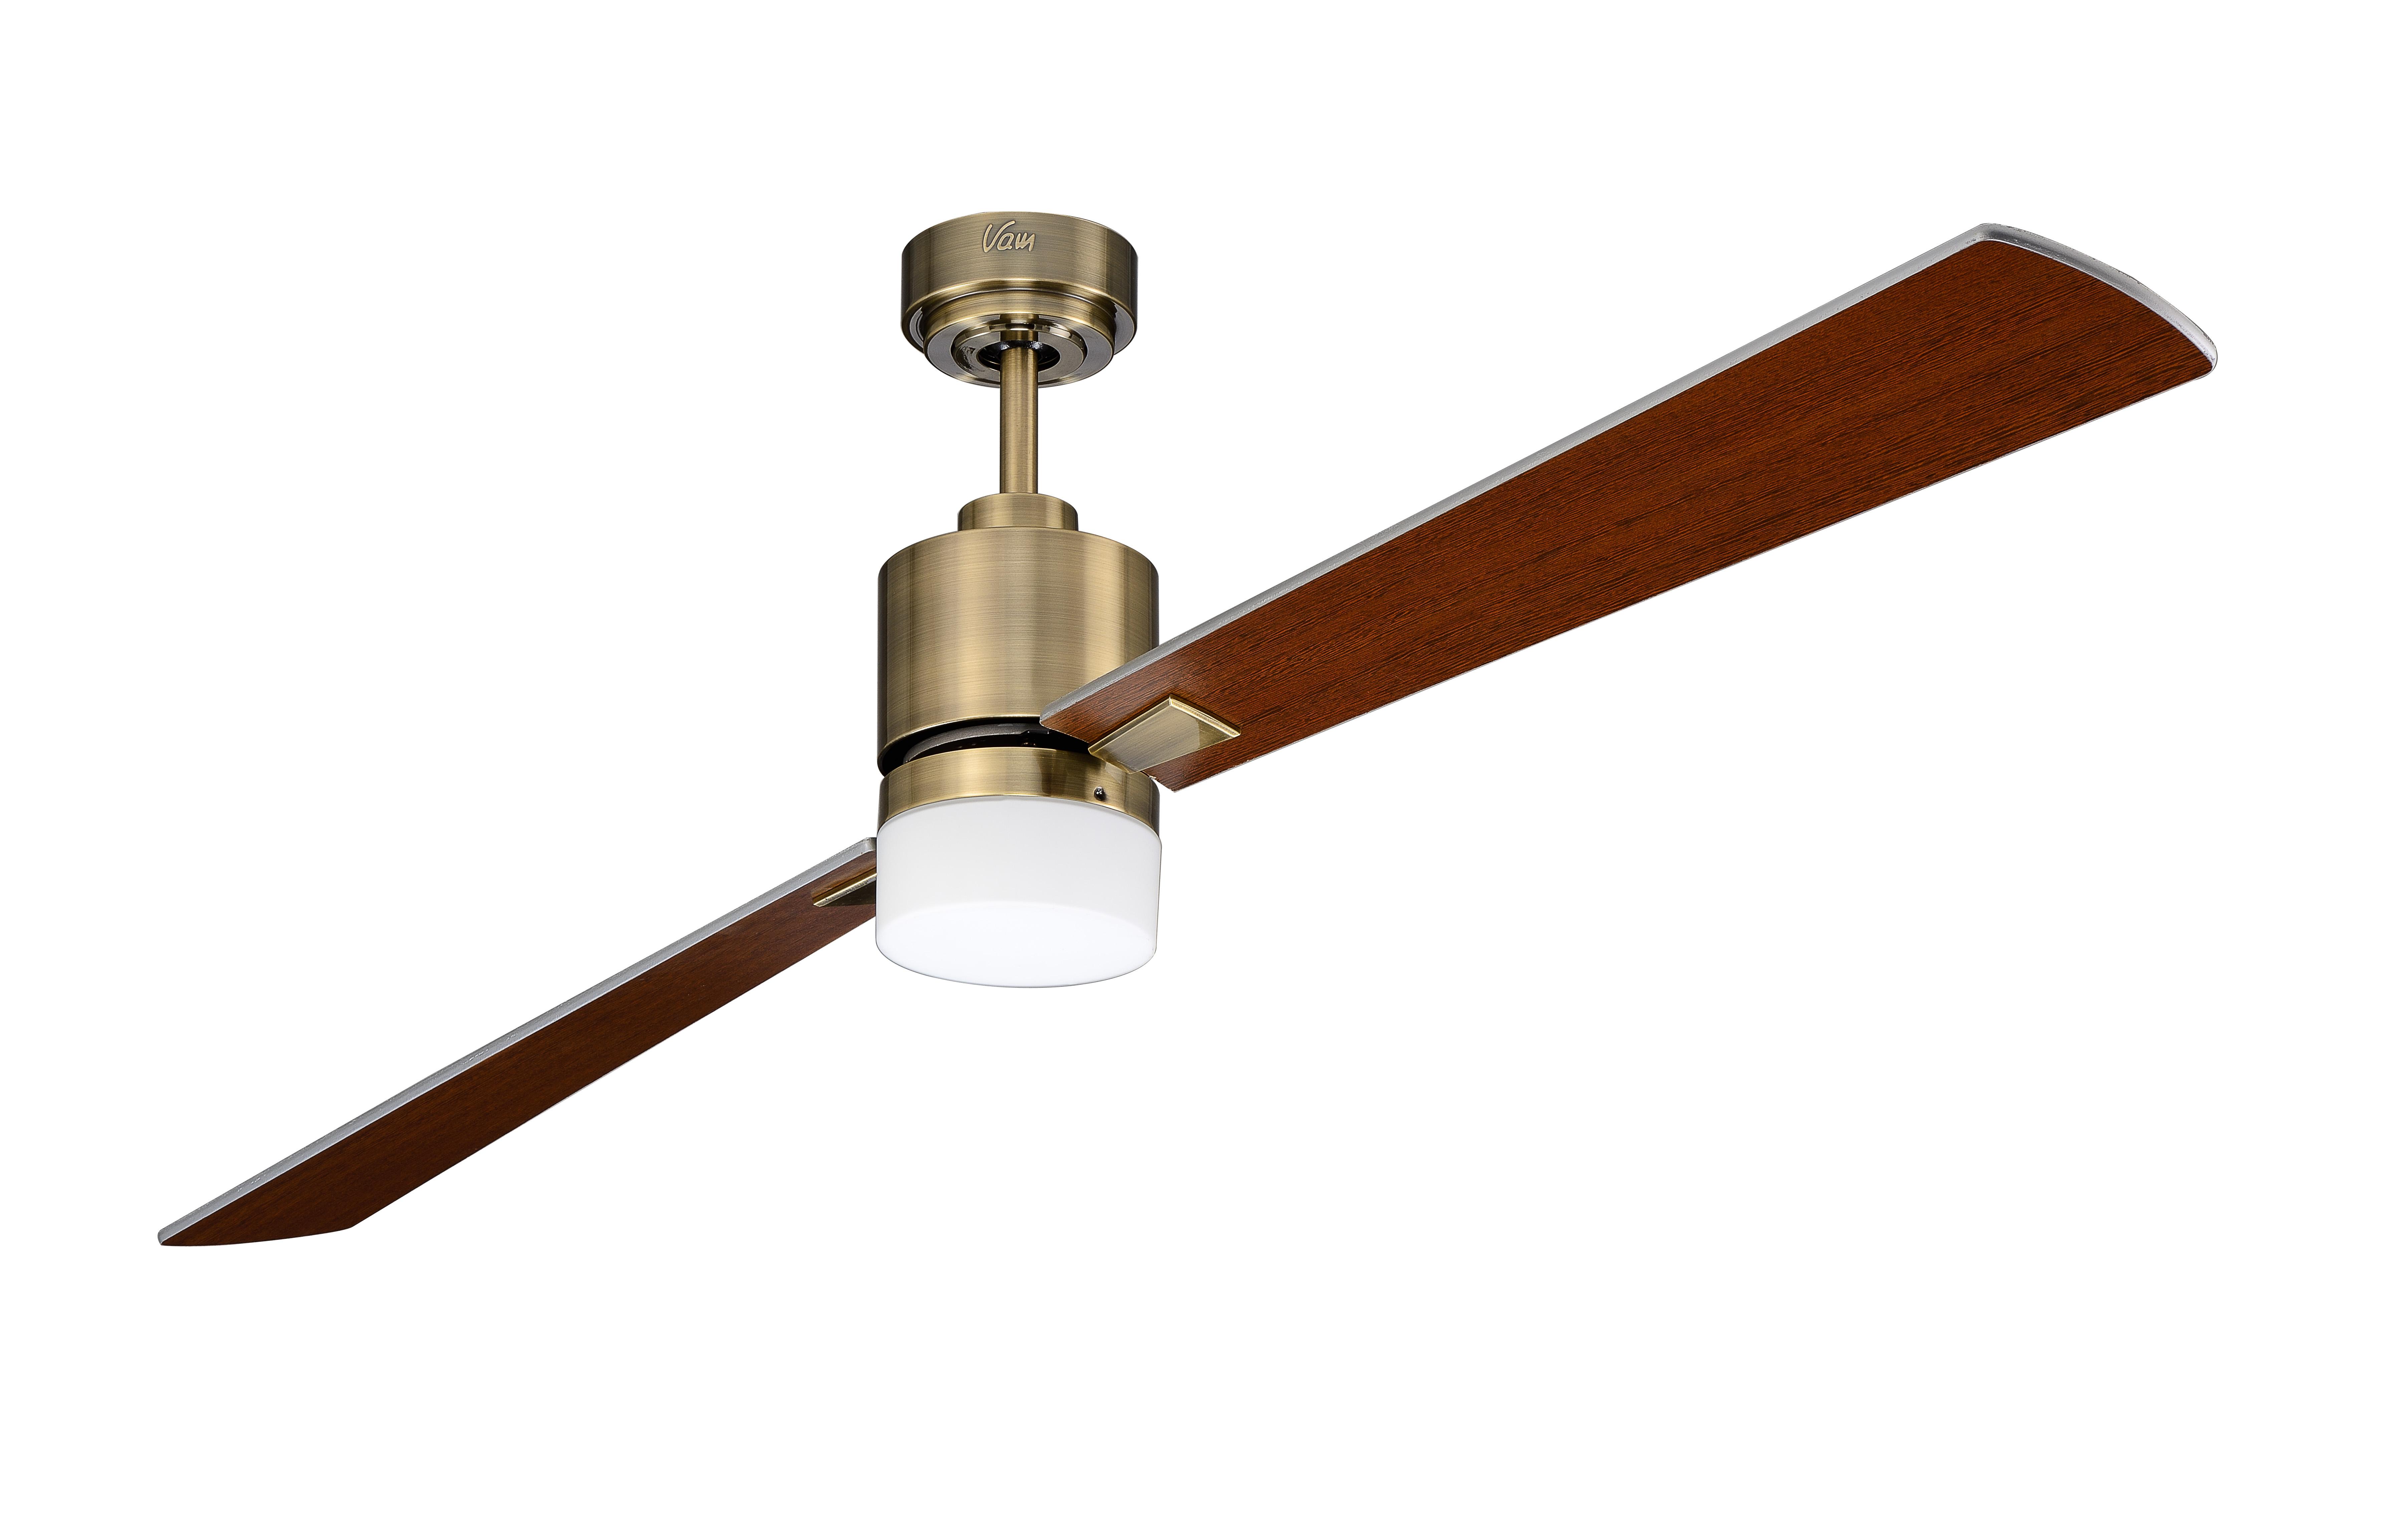 Ceiling fan FACTORY antique brass 90 CM